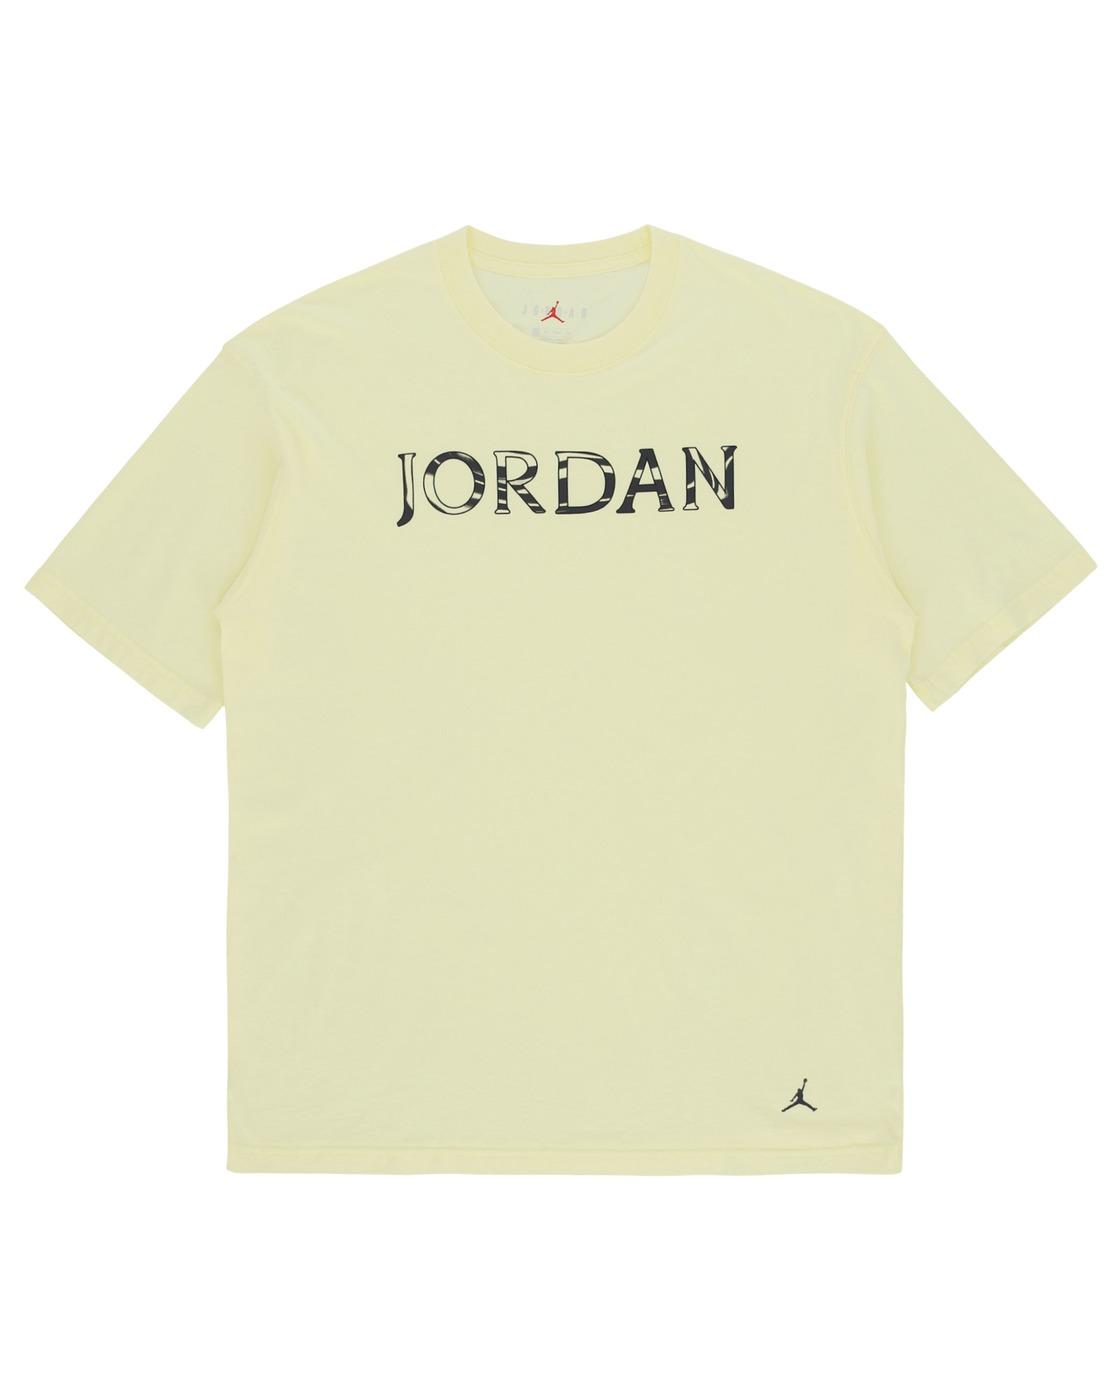 Nike Jordan Utility Oversize T Shirt Citron Tint